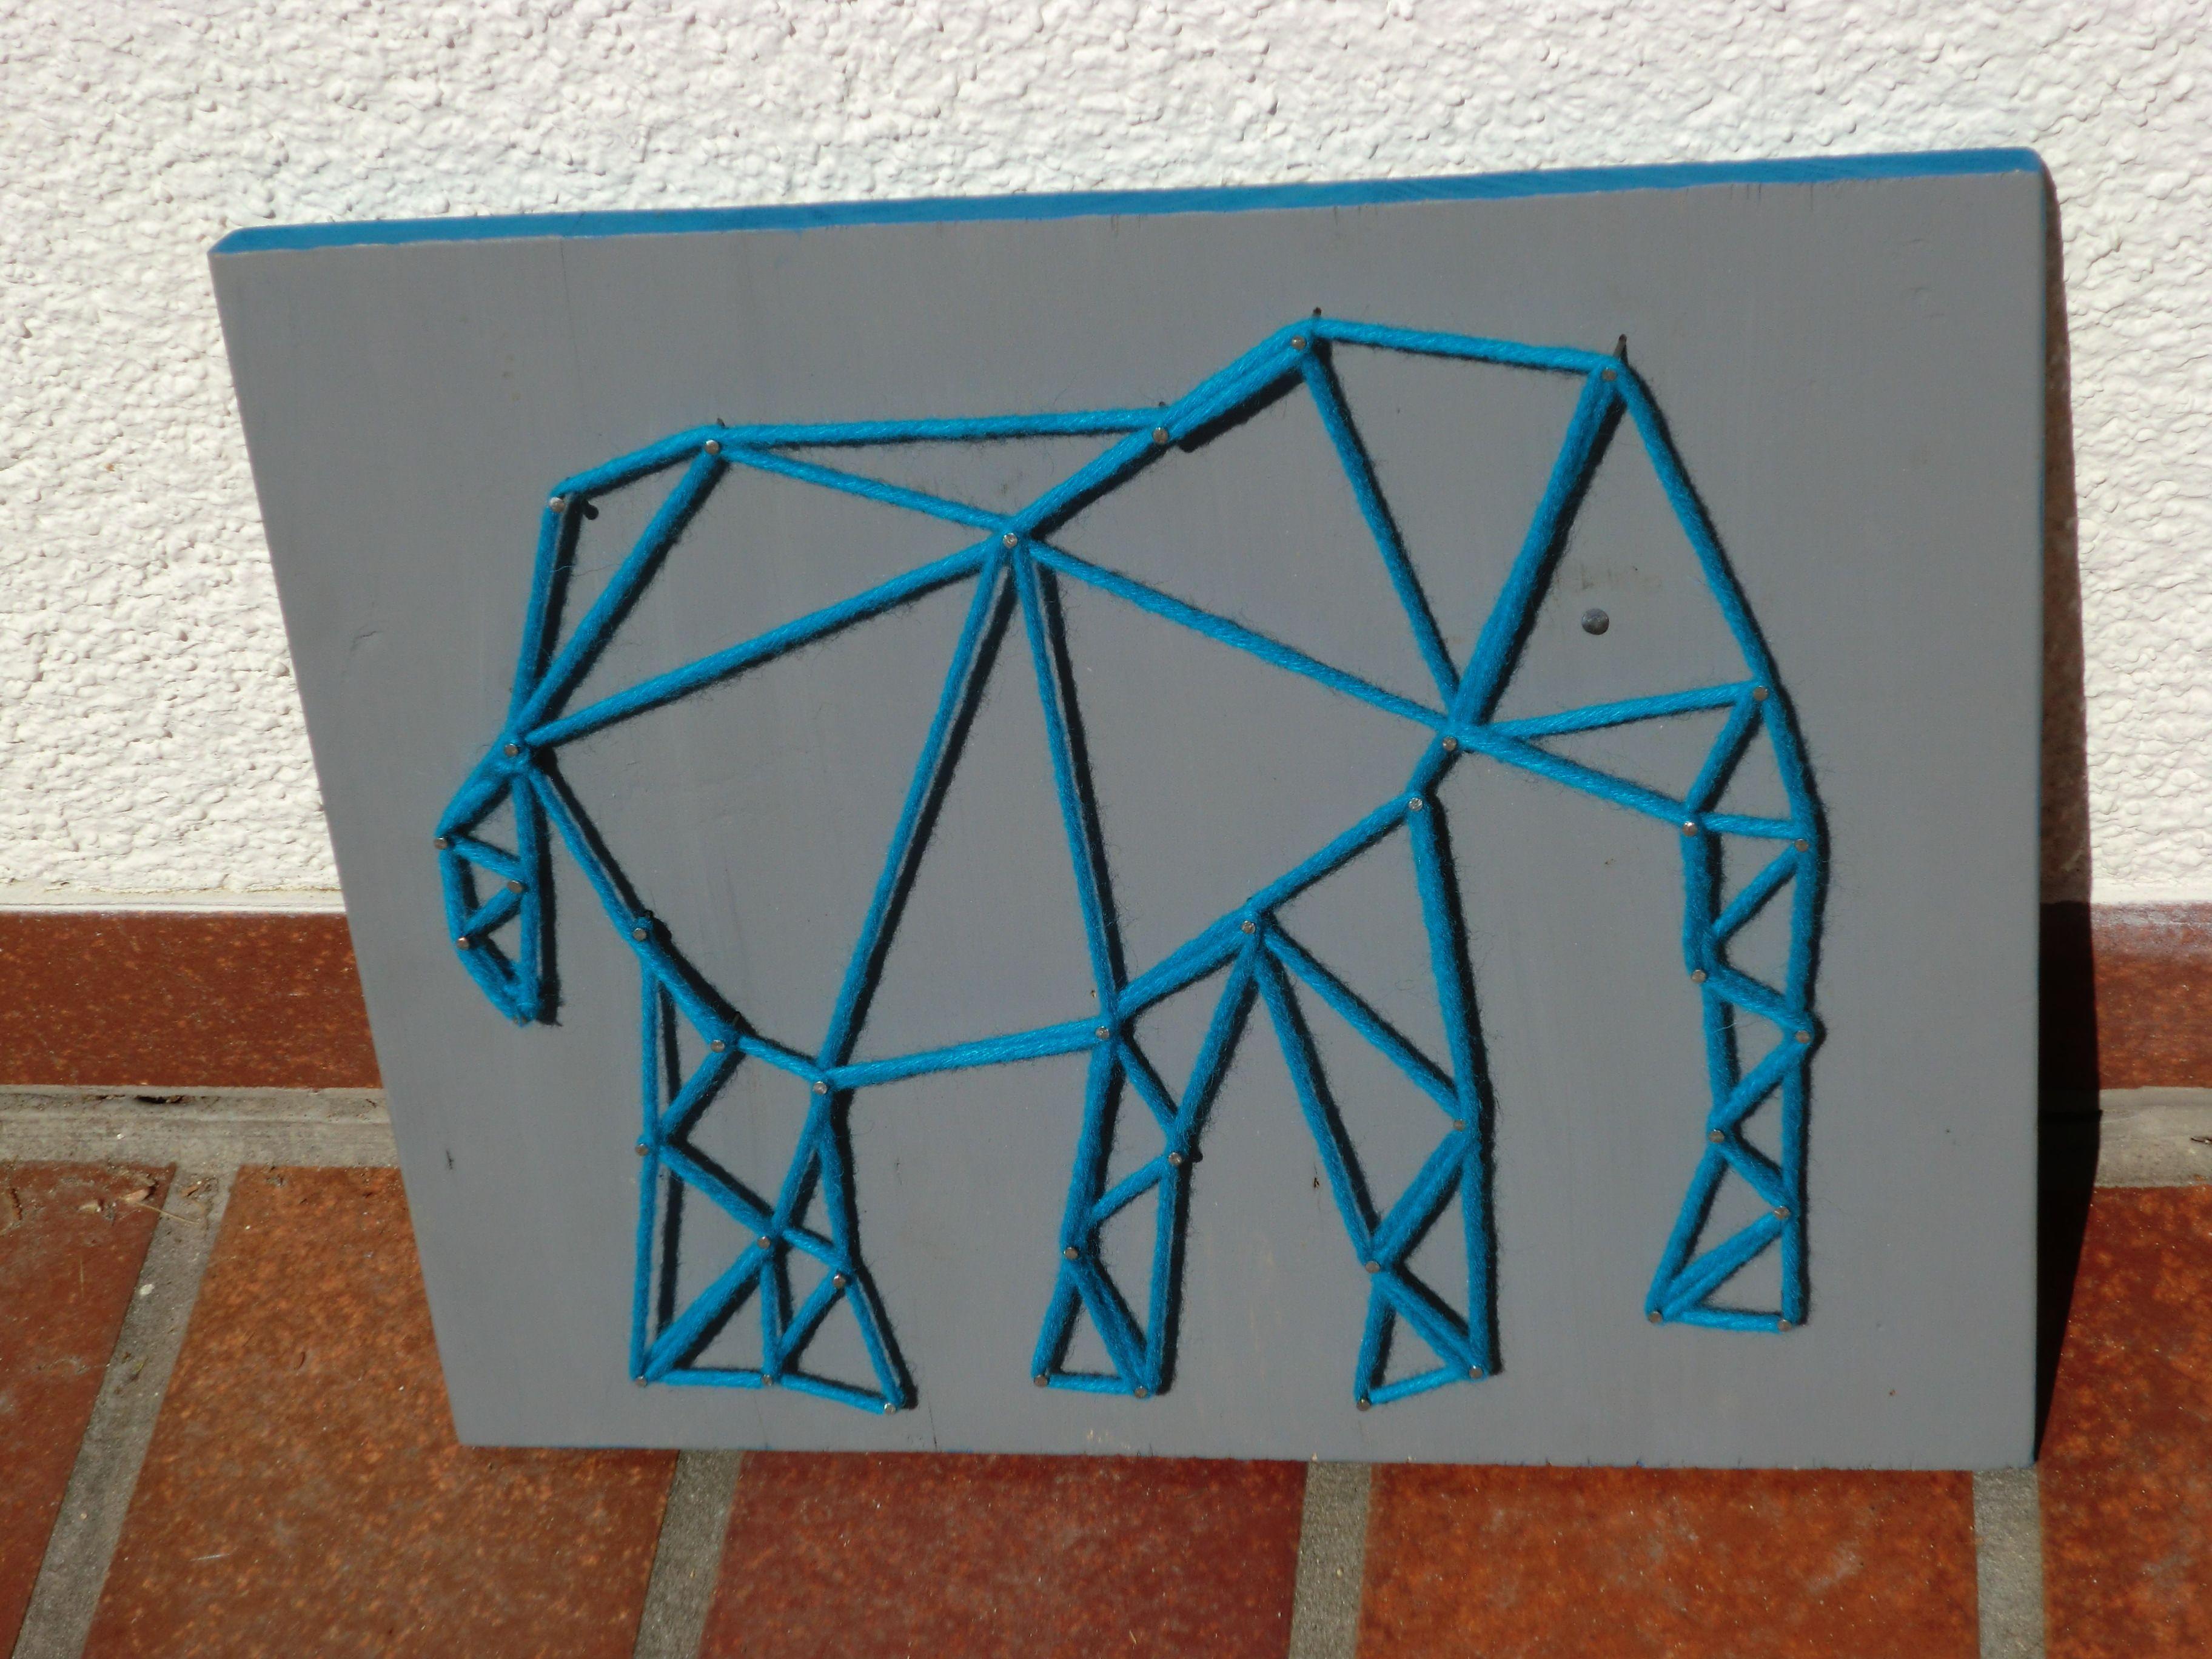 Elefant, Nagelbild, Fadenbild | Zooschule Aktions- od. Bastelstand ...